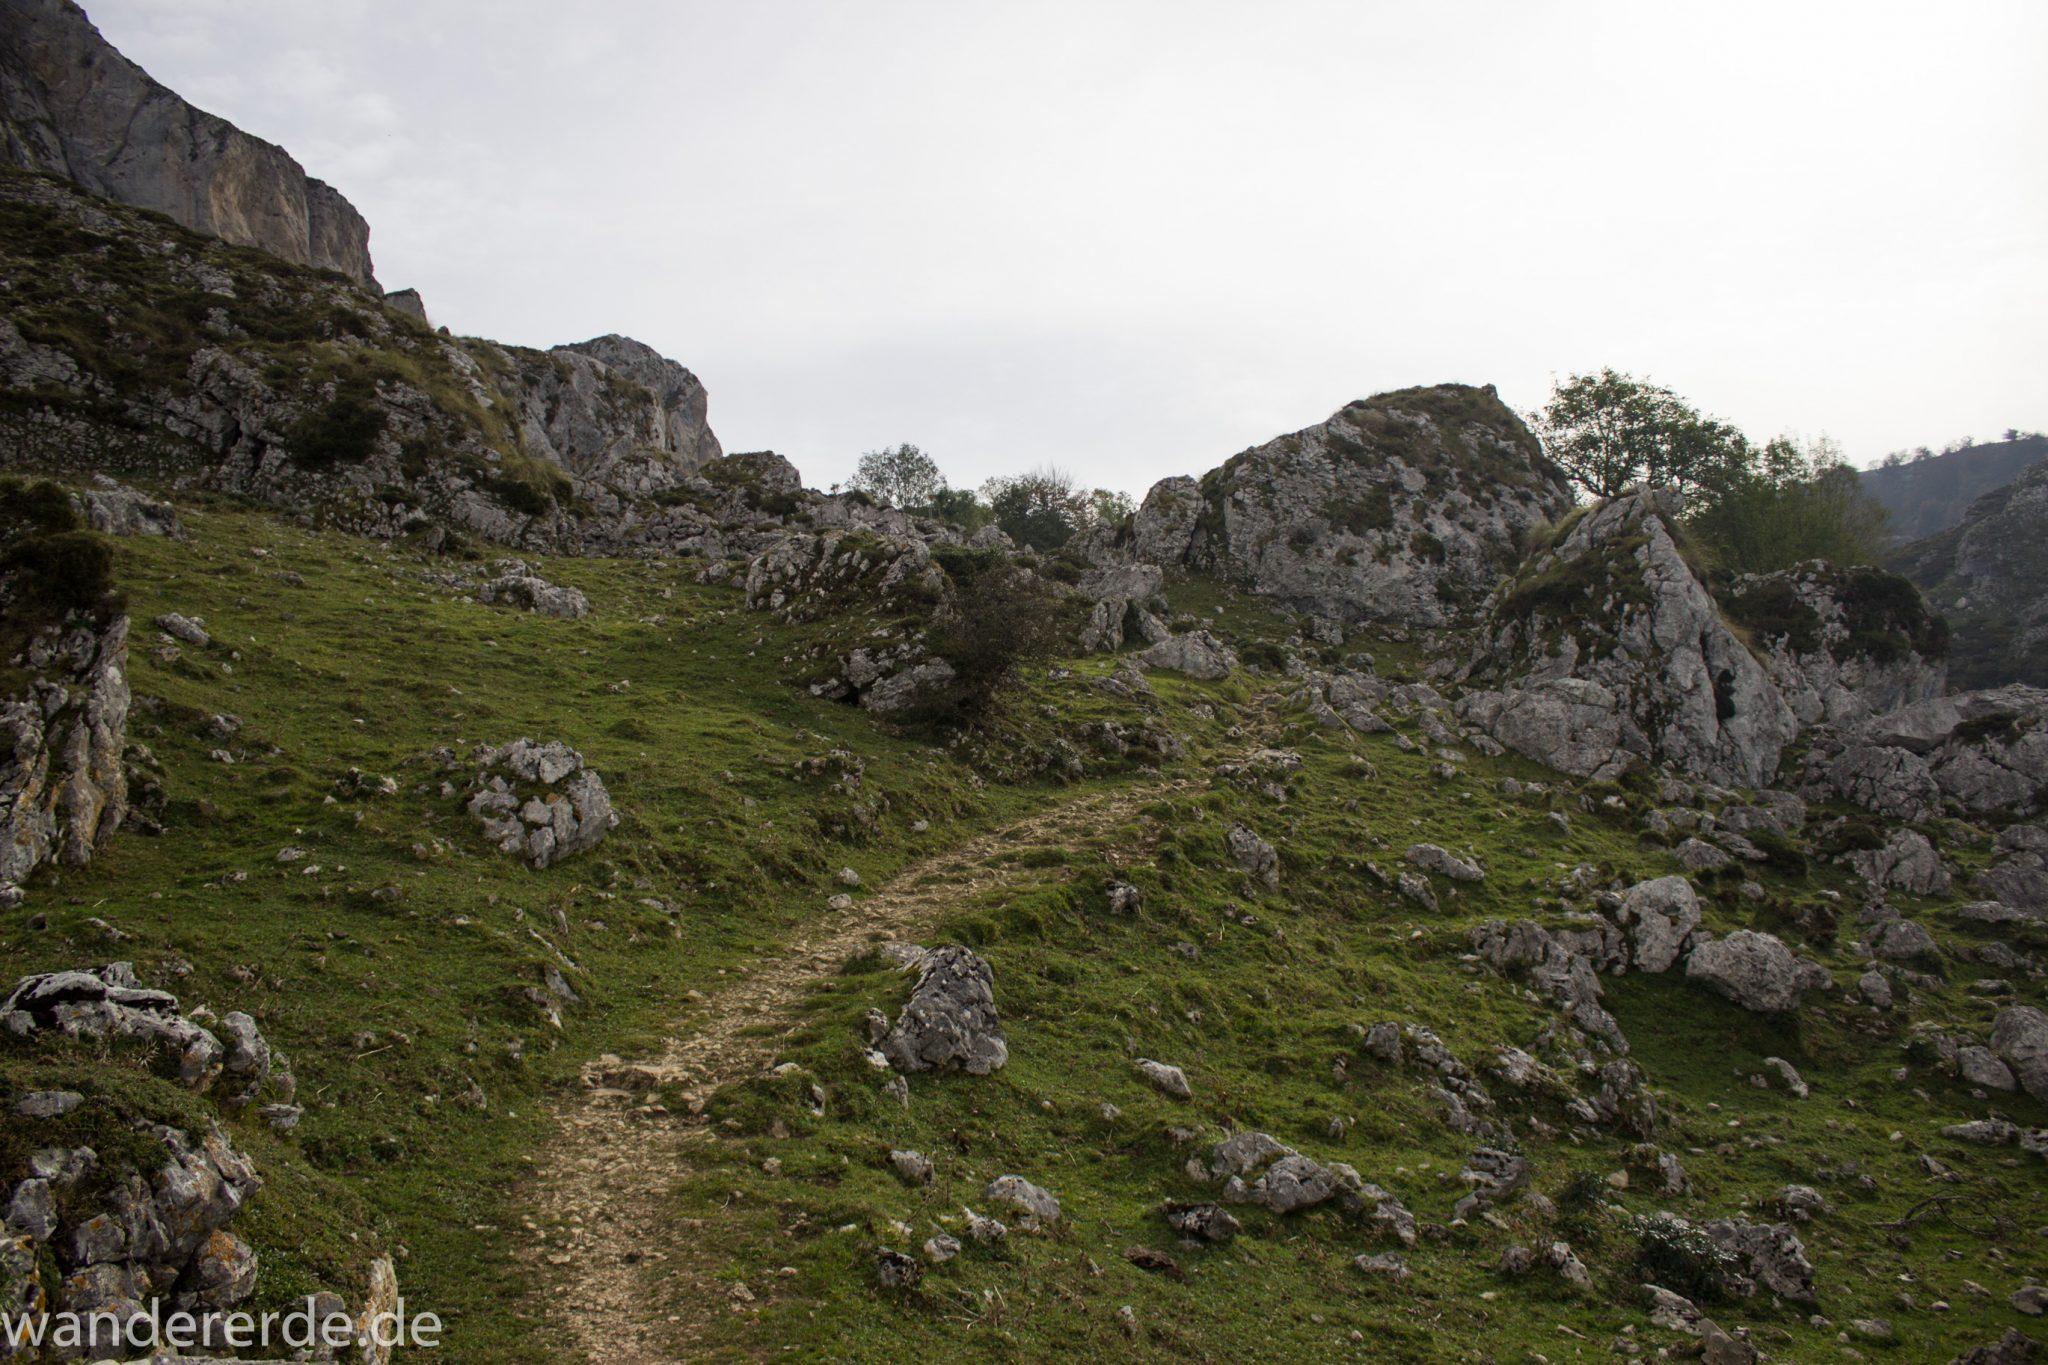 Wanderung Vega de Ario Picos de Europa Spanien, Kieselsteine, Berge, Wolken, kurze Sicht, grüne Wiese, zerklüftete Felsen, Bergregion, schmaler Wanderpfad